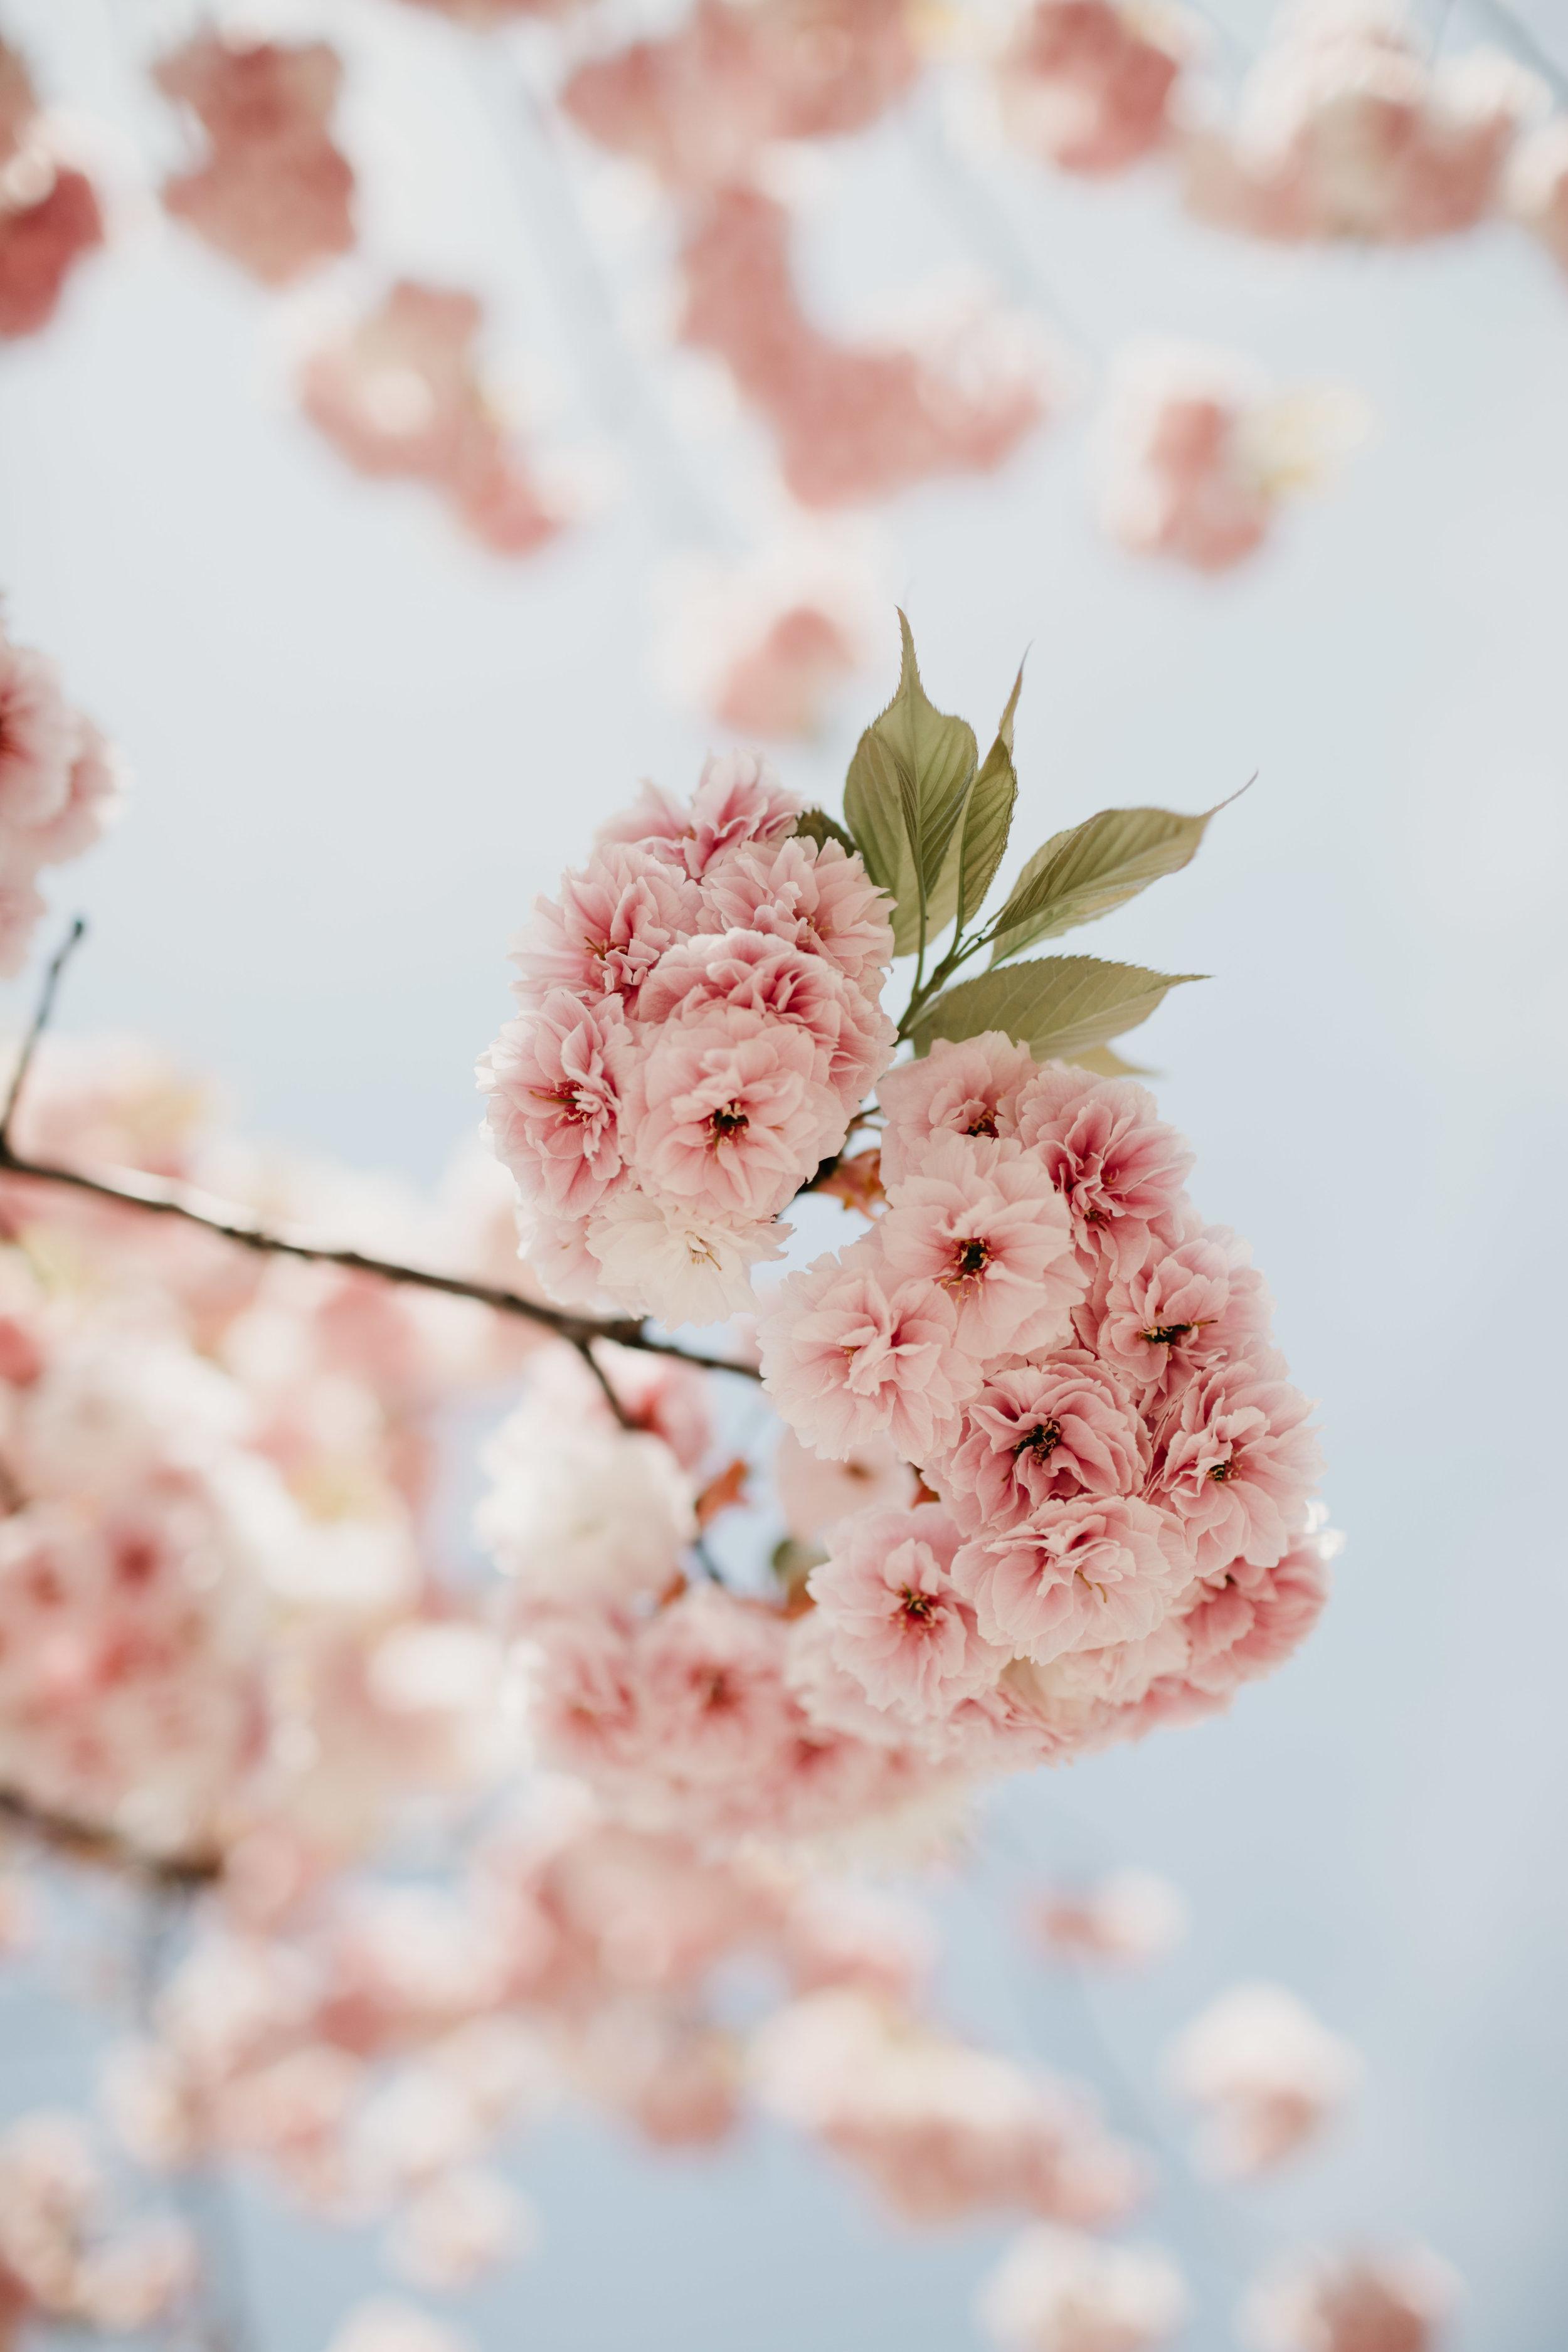 tokyo-sakura-photo-by-samantha-look.jpg